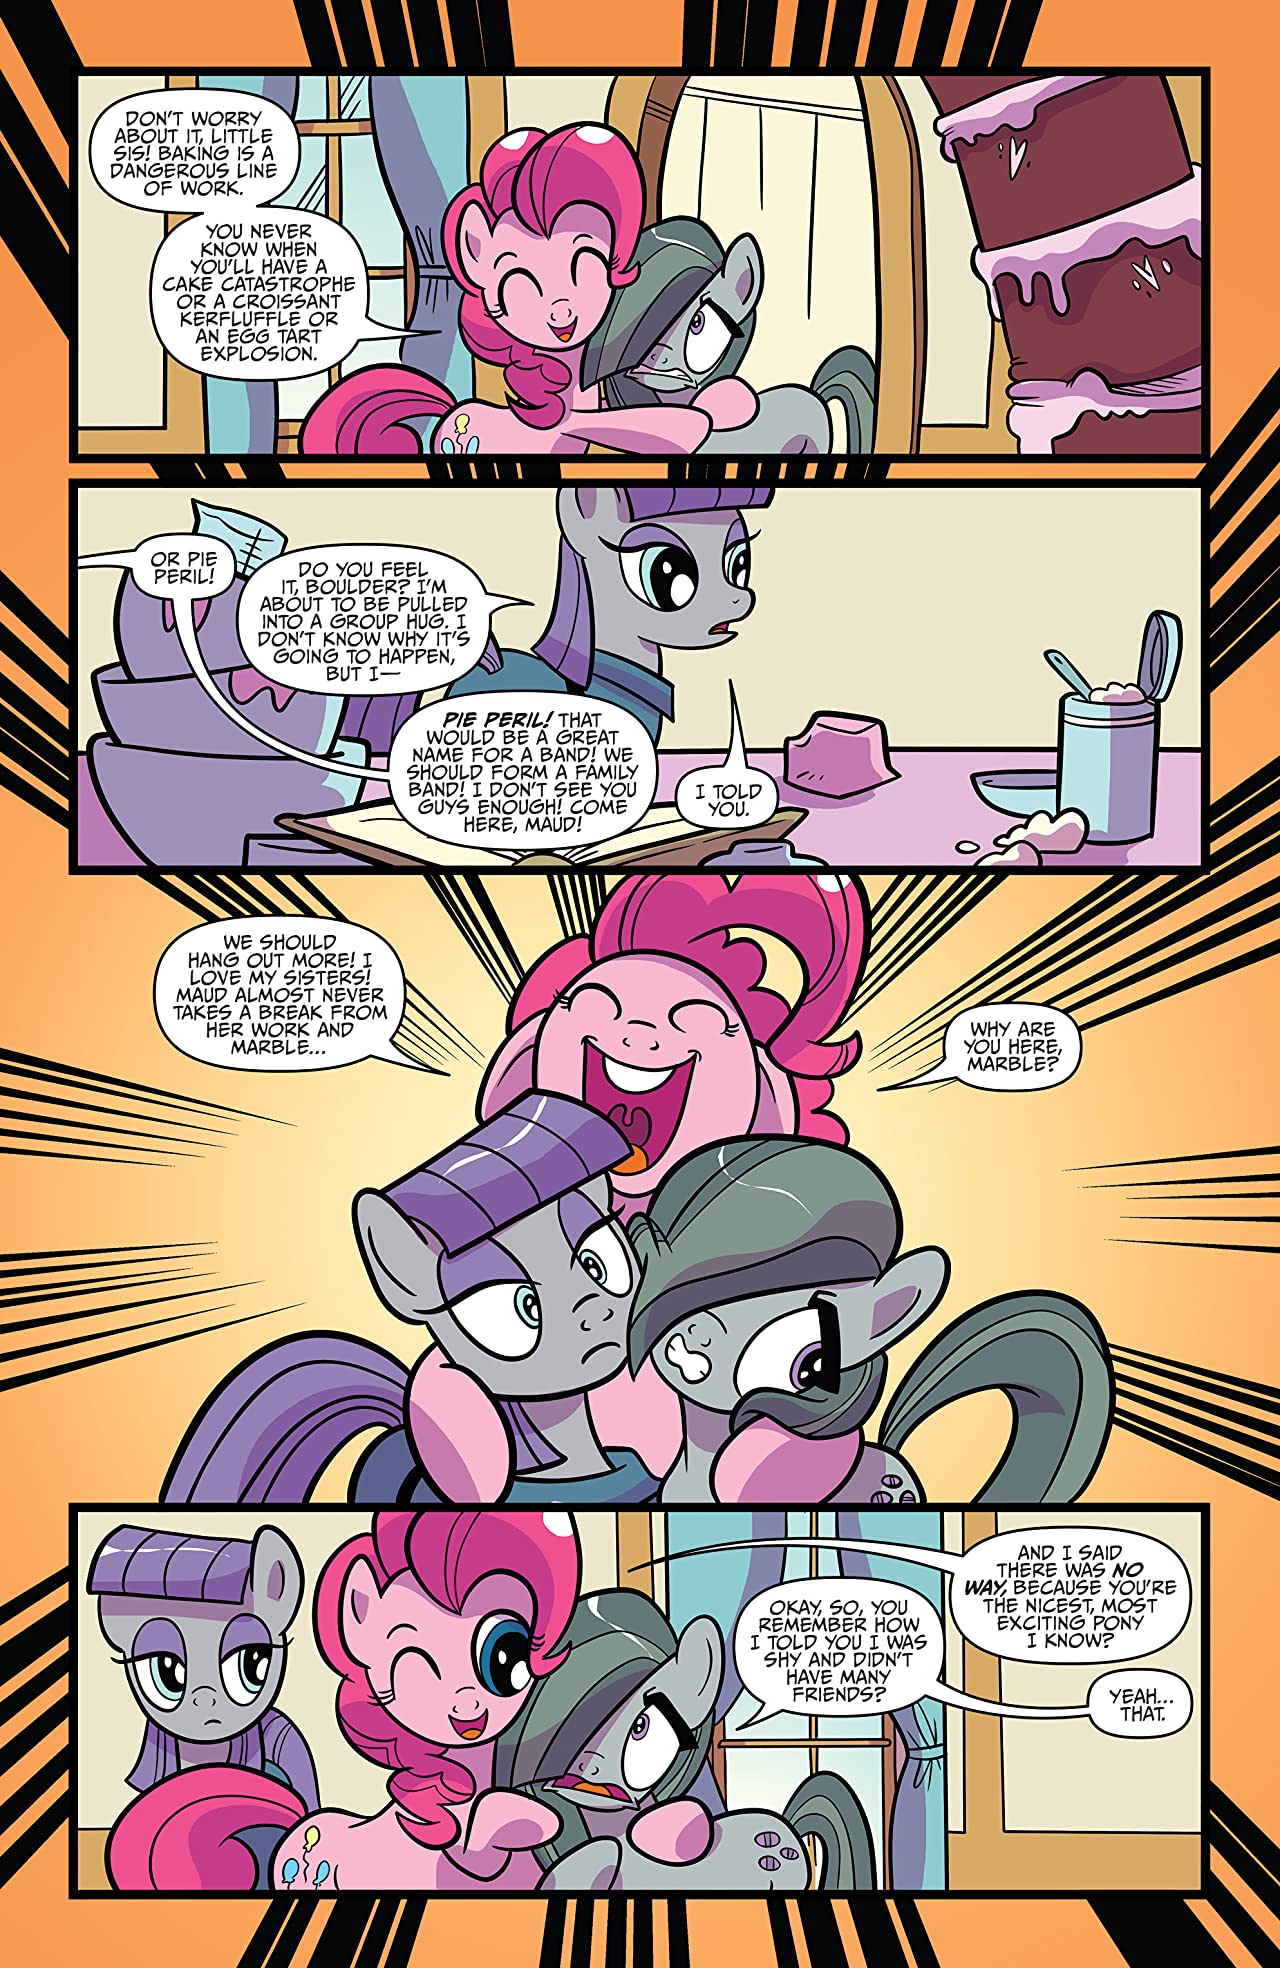 My Little Pony: Friendship is Magic #86